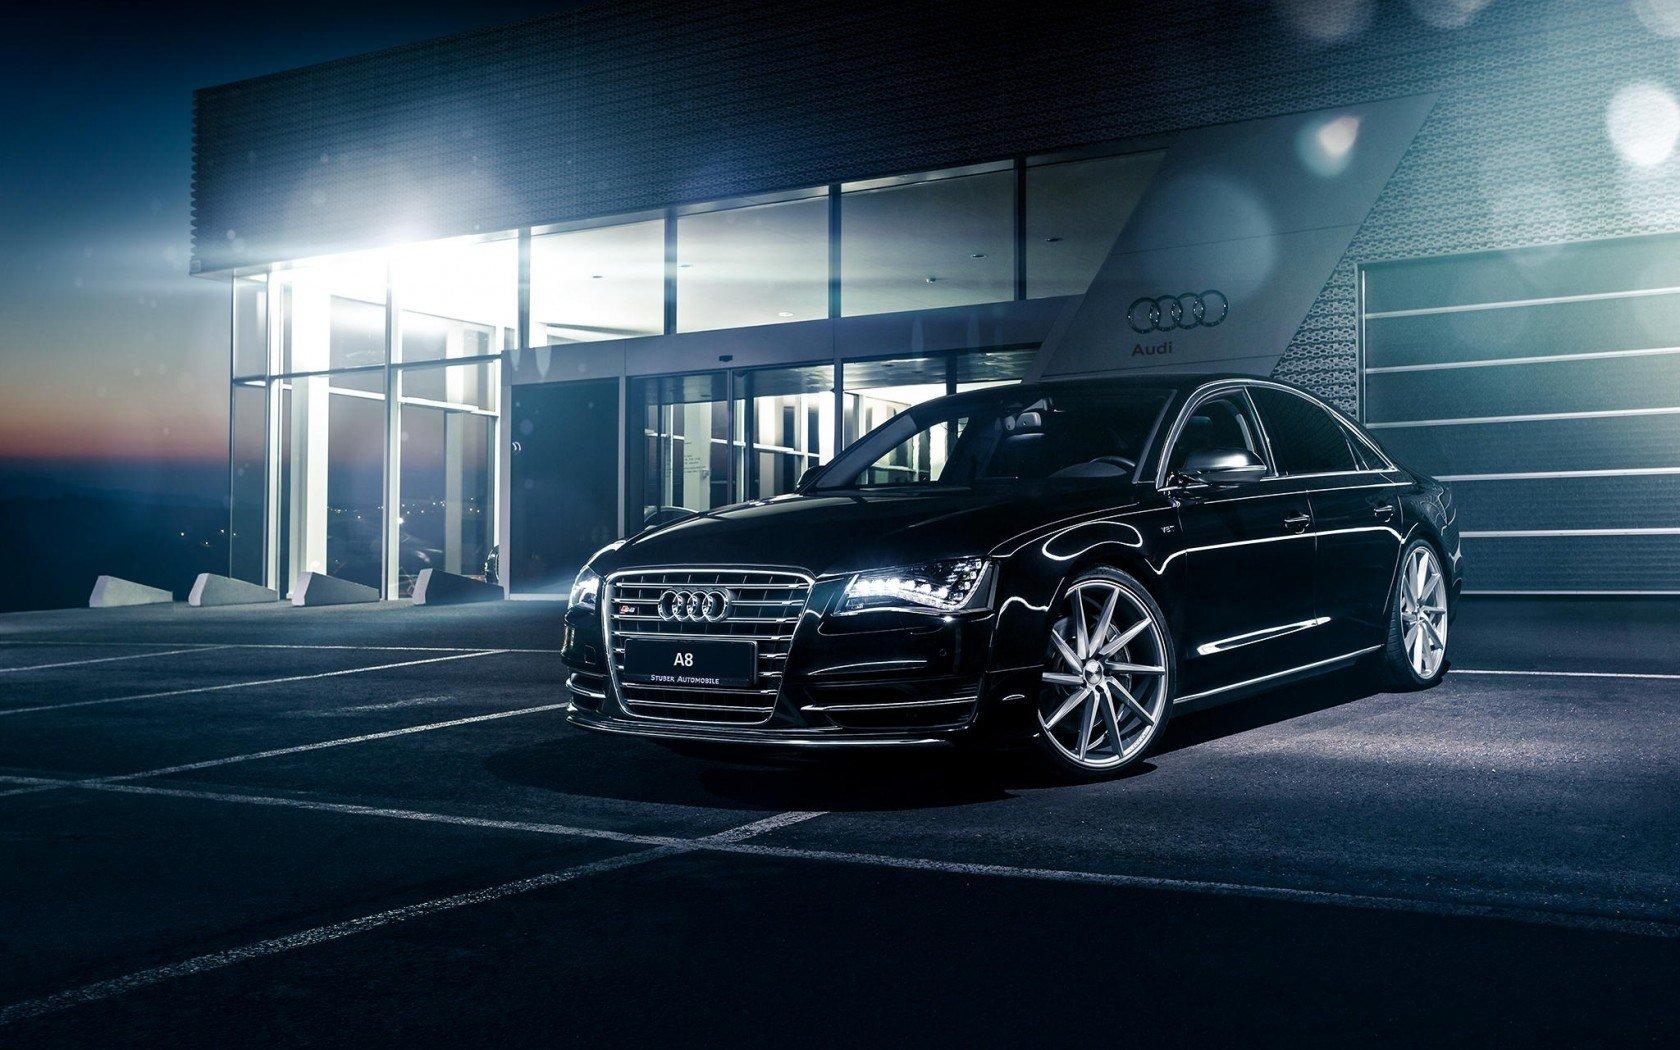 44 Audi A8 Wallpaper Hd On Wallpapersafari